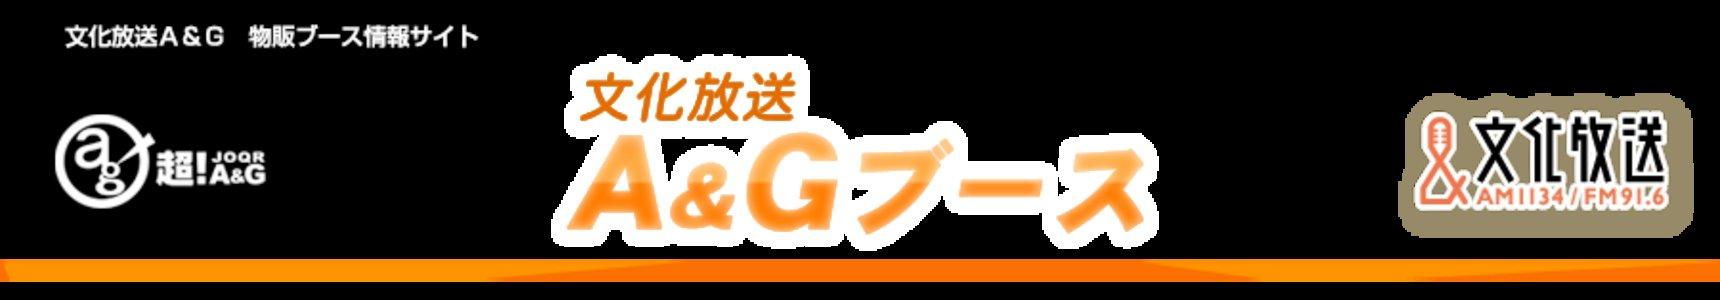 AnimeJapan 2015 1日目 文化放送A&Gブース 『A&G NEXT GENERATION LadyGo!!』お渡し会(高森回)